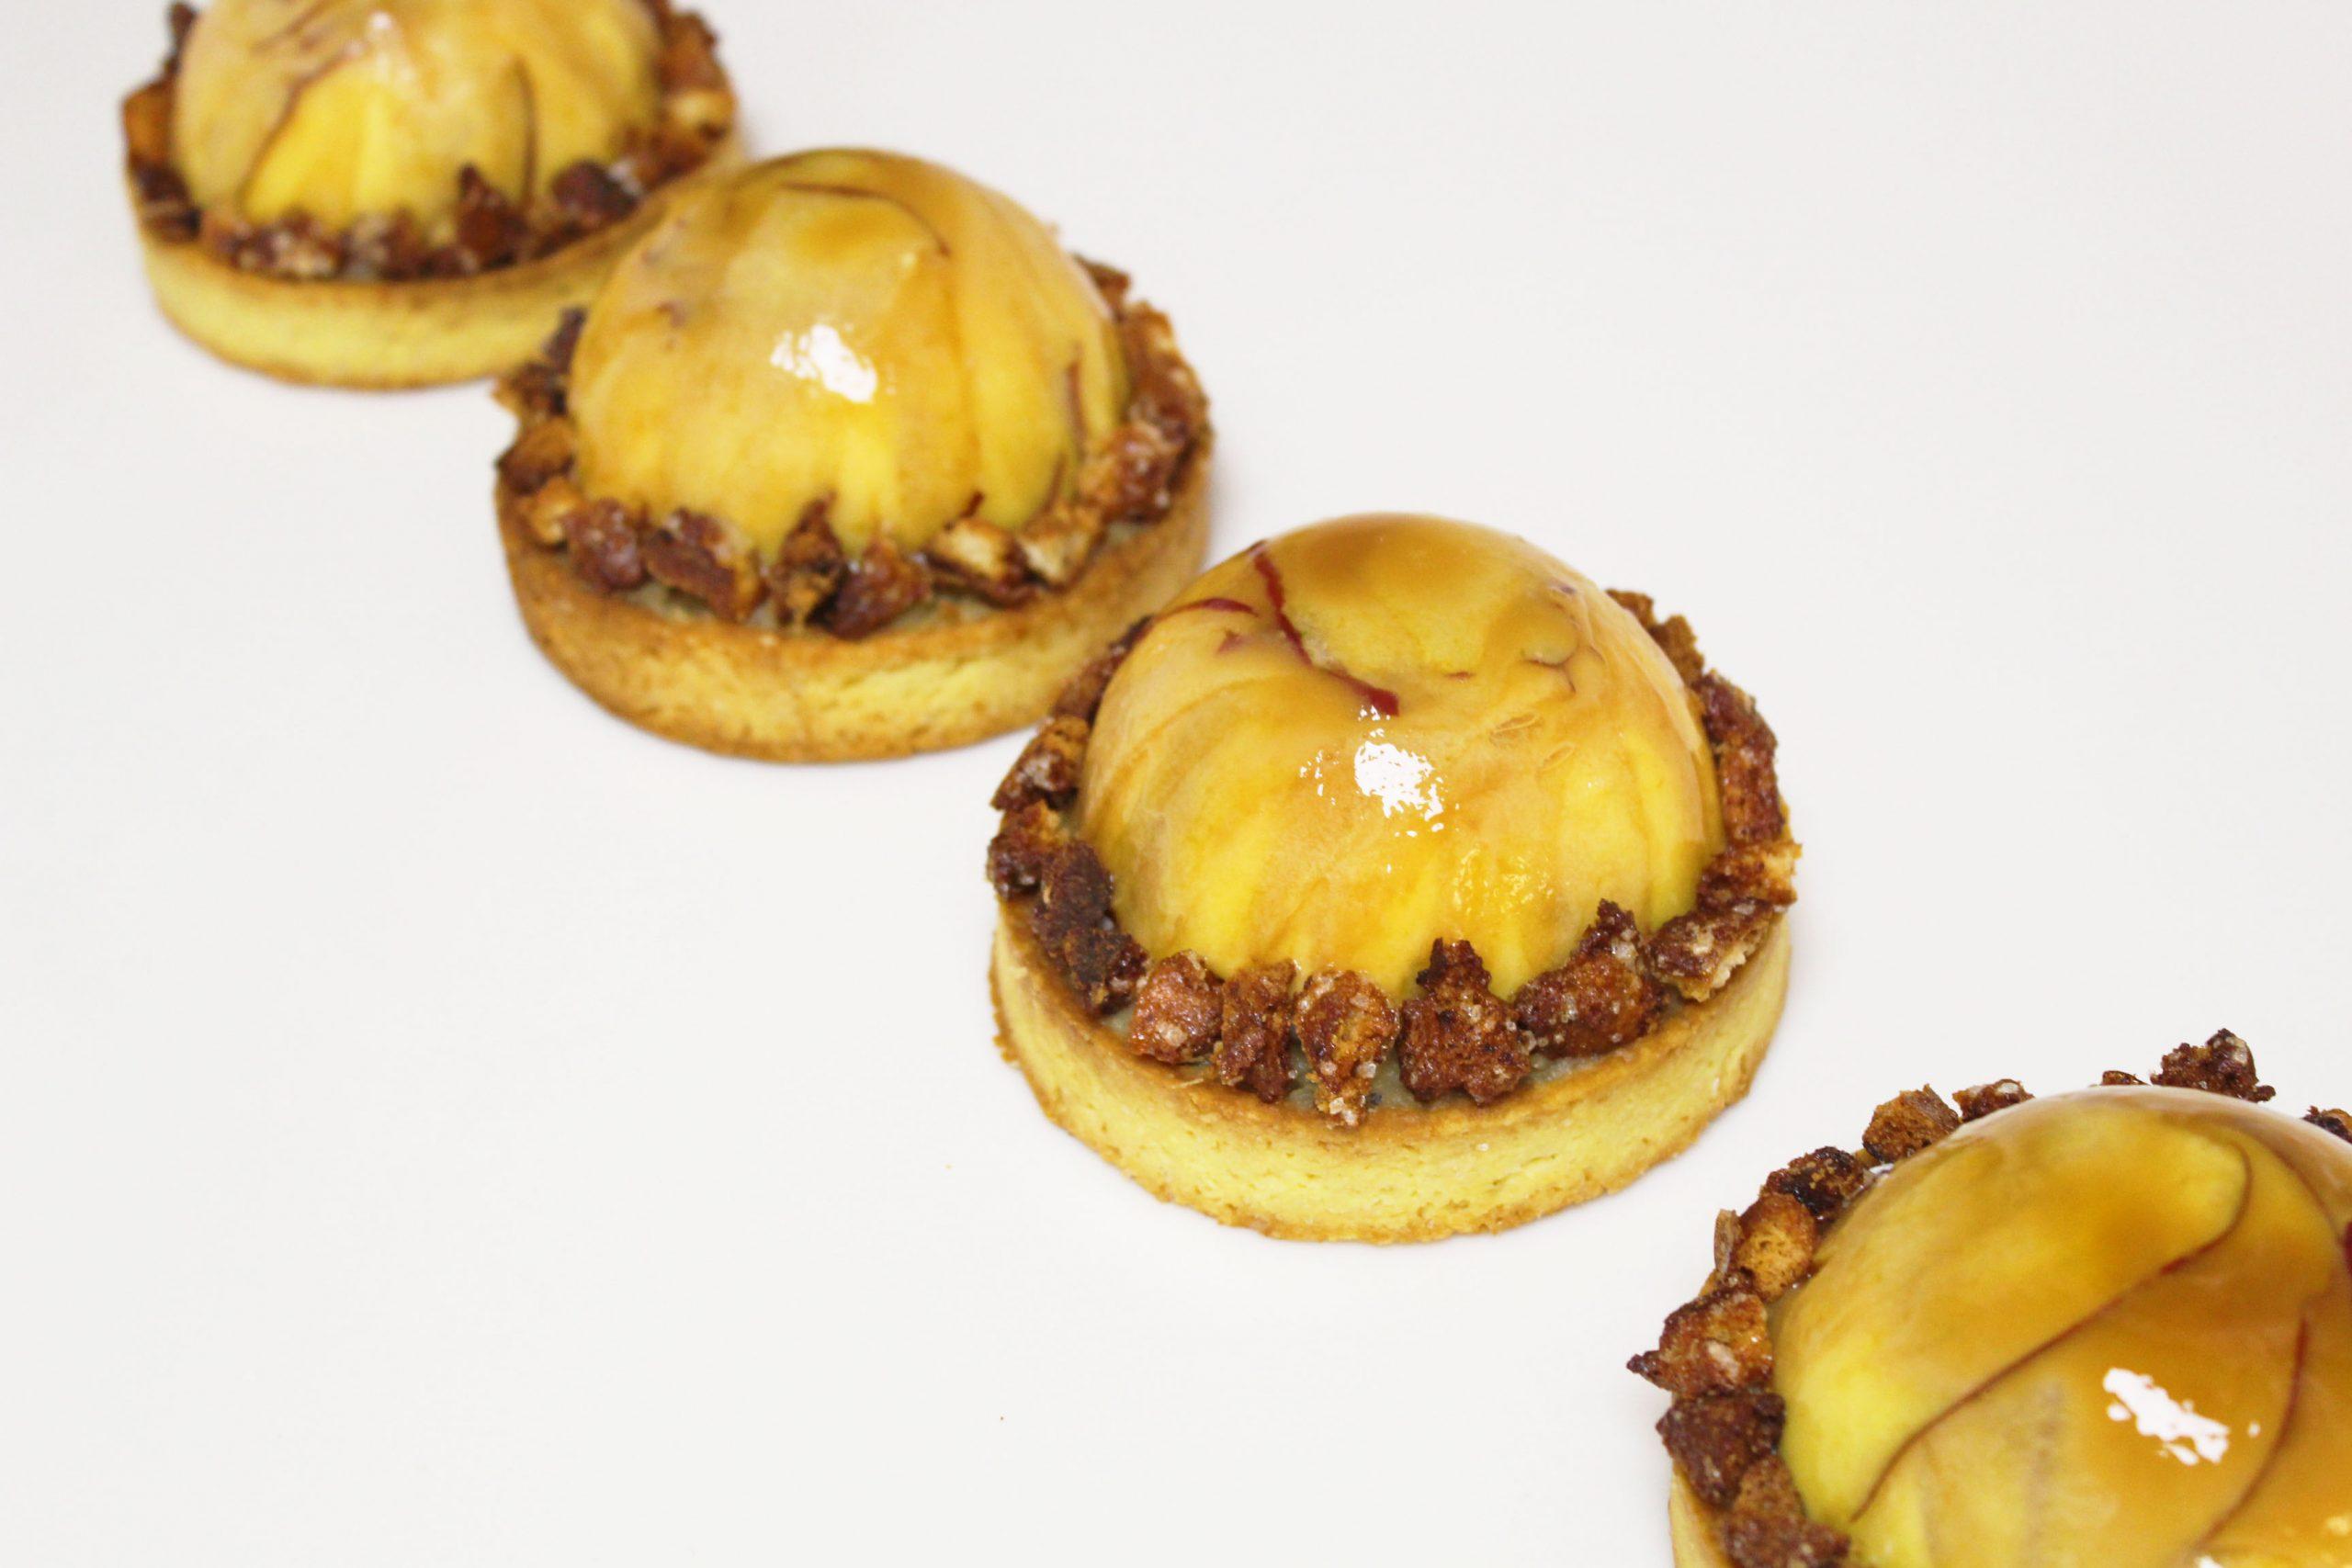 Apple and Cardamom Pies